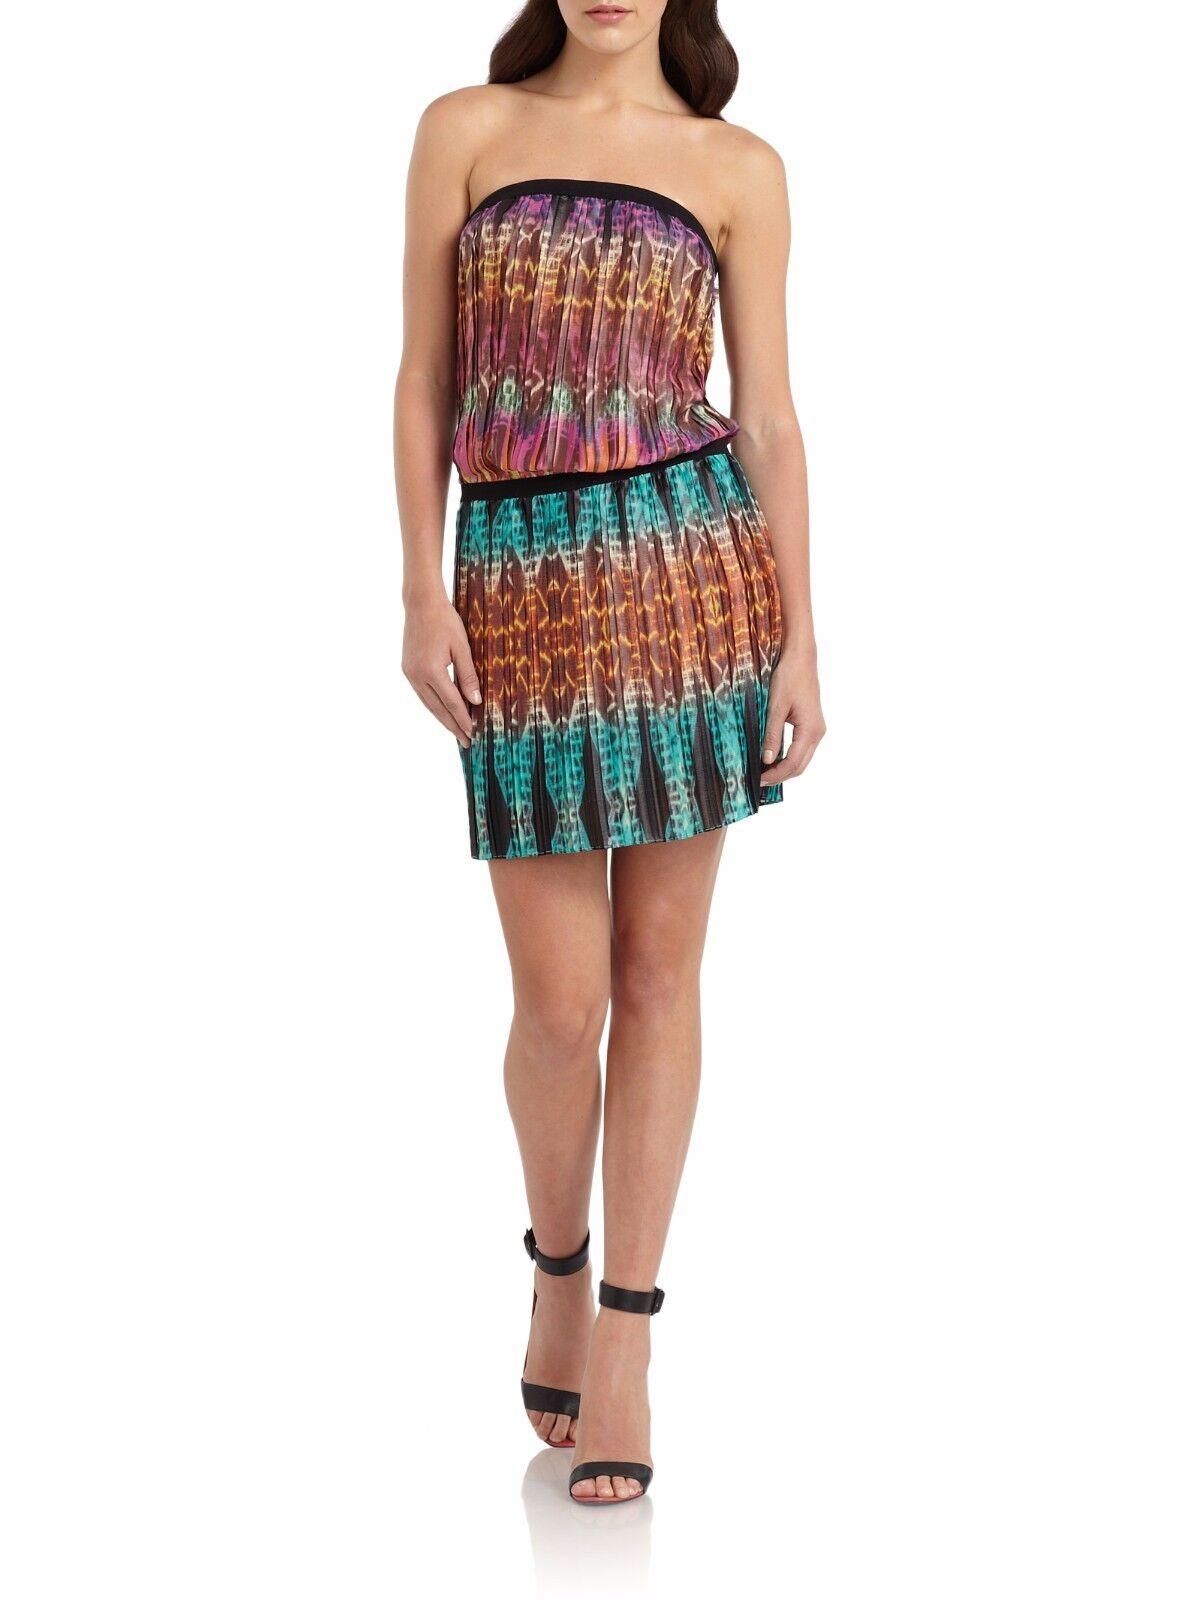 NWT BCBG BCBG BCBG Maxazria L taja printed strapless mini dress pleated  278 multi color 8cd0ae